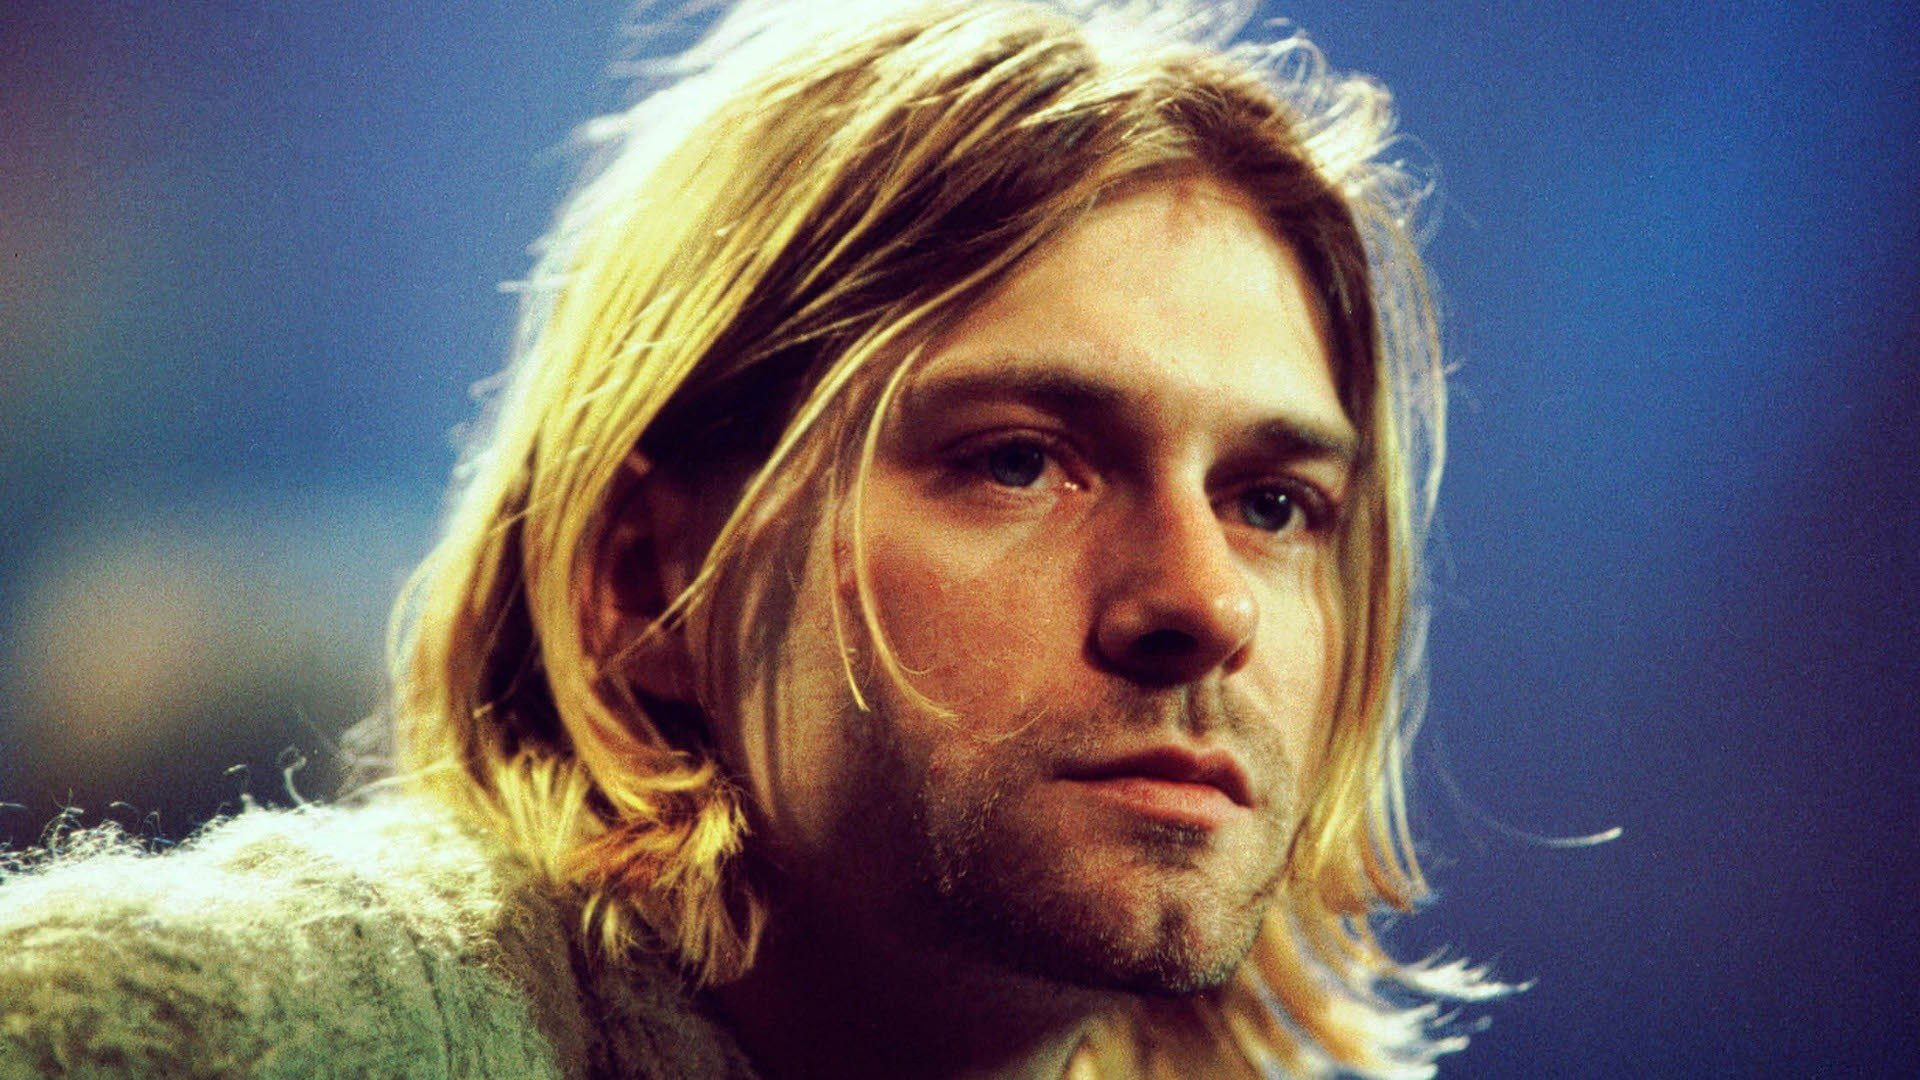 Nirvana Kurt Cobain Unplug Wallpaper